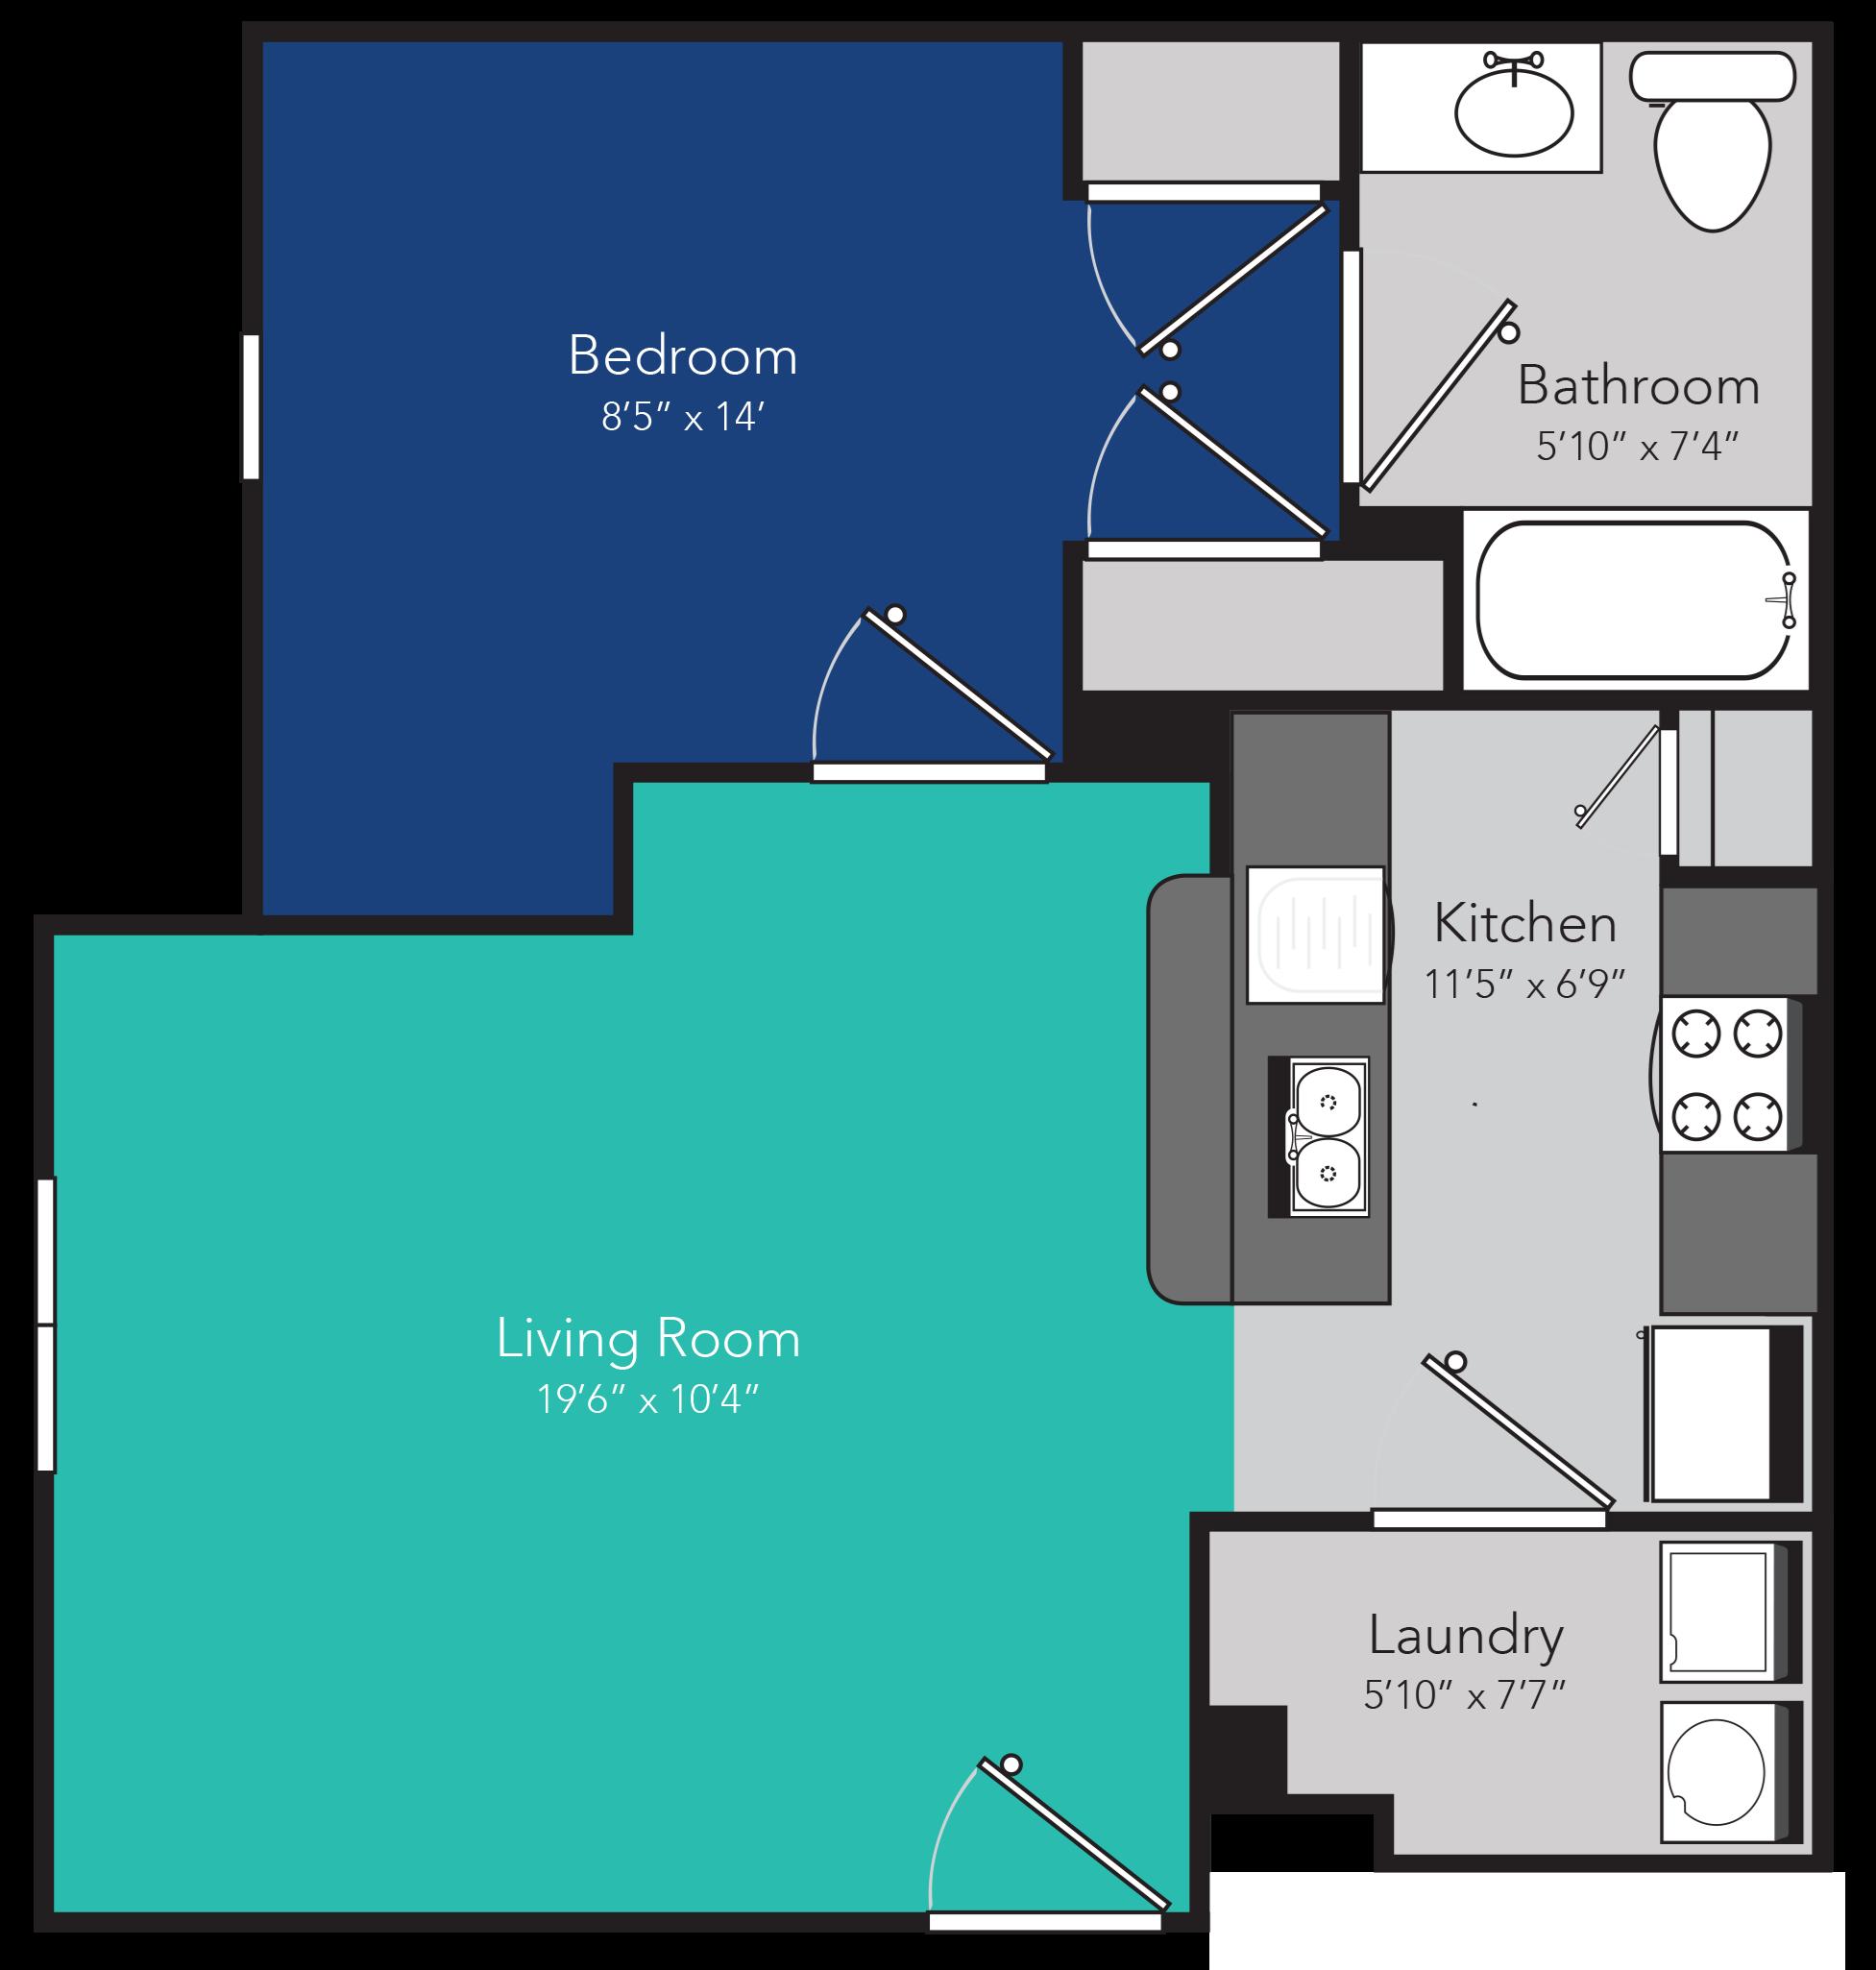 Hinesville ga apartments for rent ebrochure - One bedroom apartments in hinesville ga ...